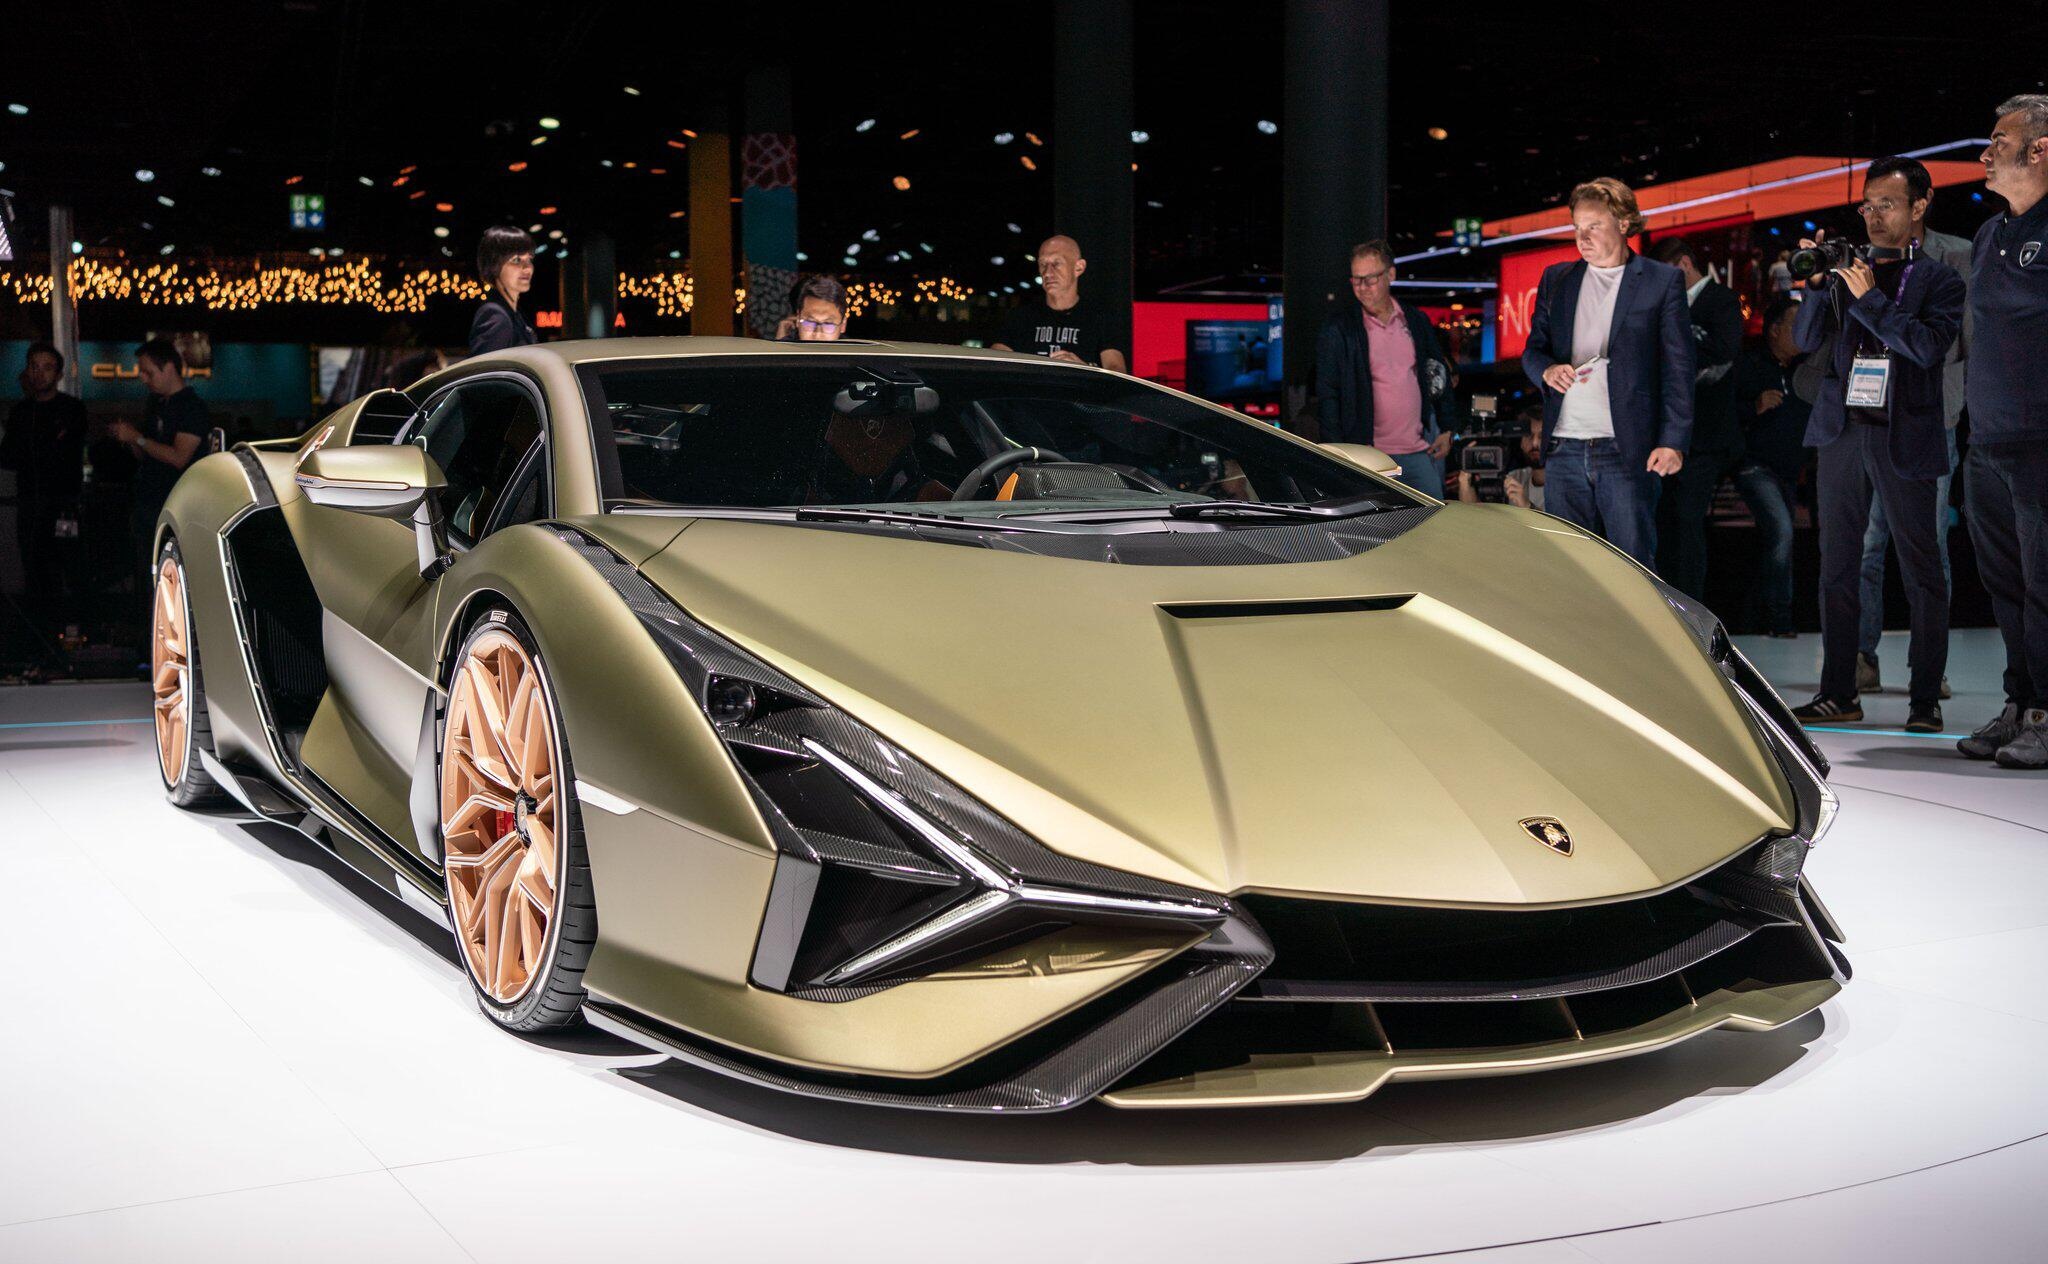 Bild zu PS-Hommage an Piëch: Hybridrenner Lamborghini Sián FKP 37